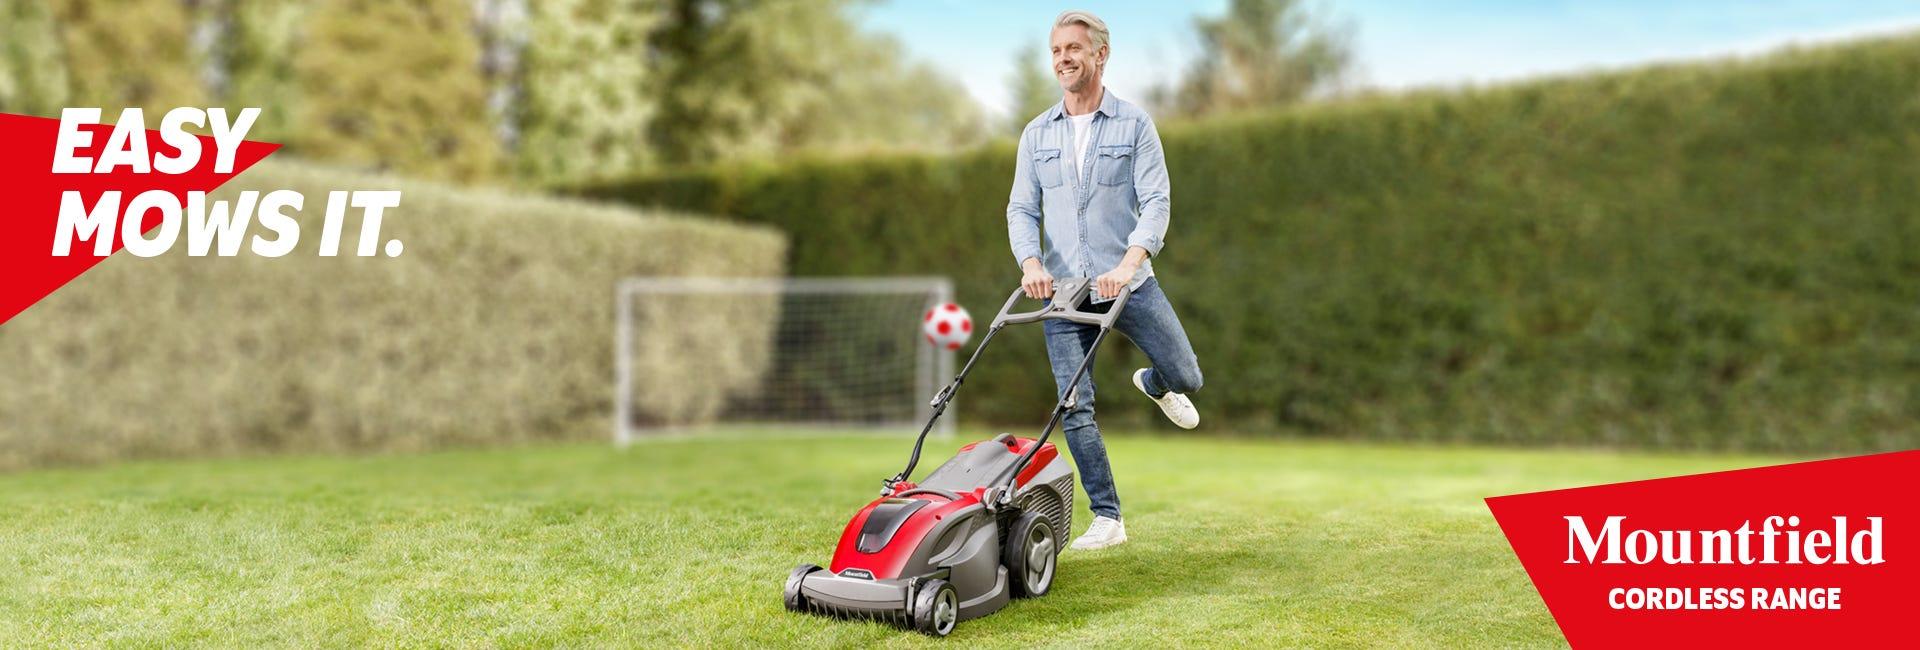 Easy Mows It - freedom500